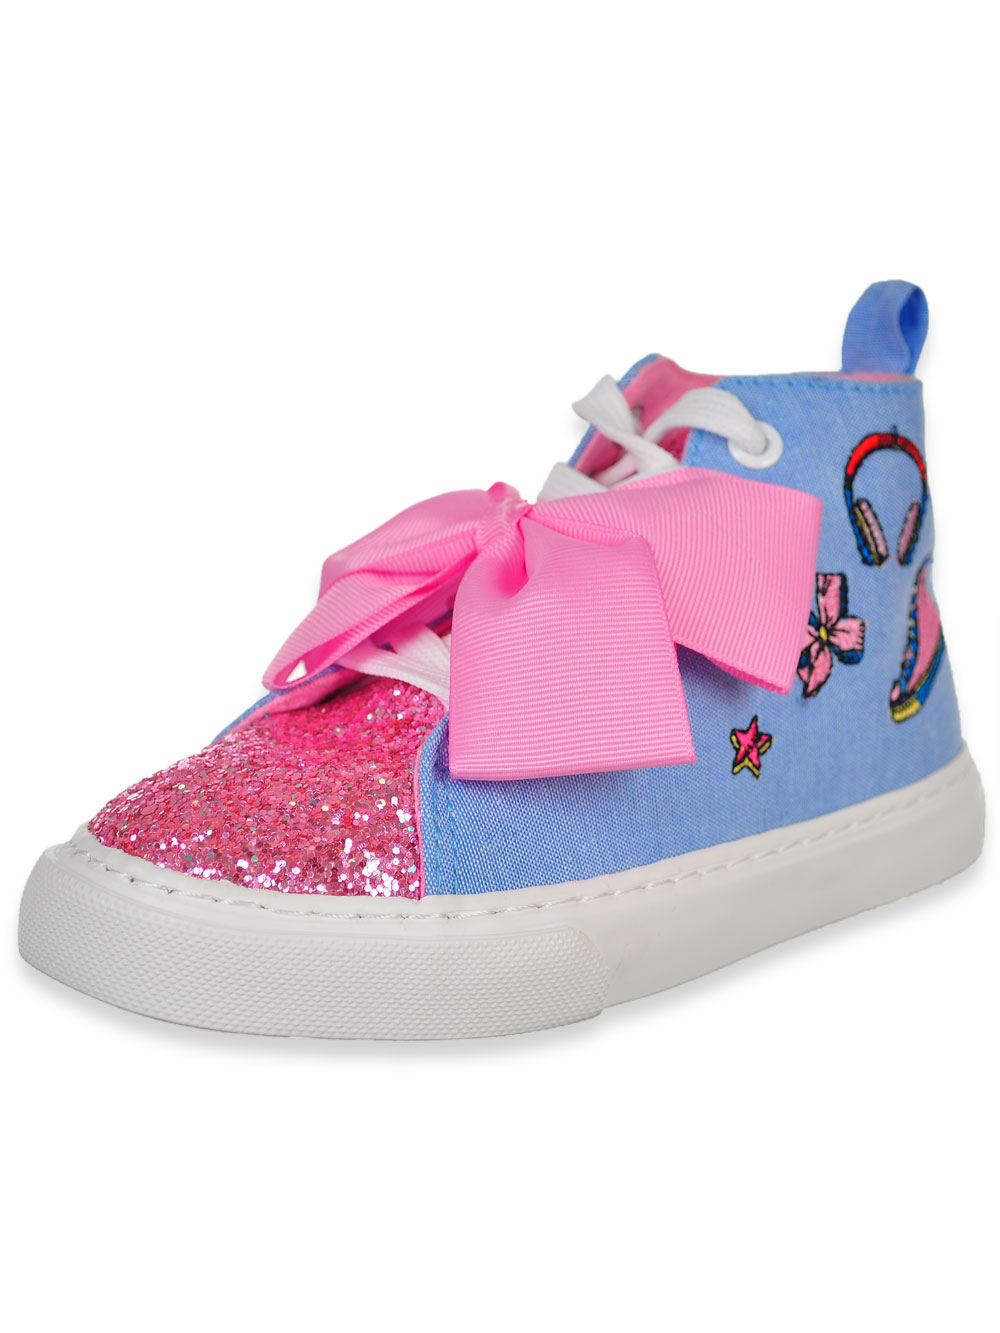 939b1625f1 Jojo Siwa Girls' Hi-Top Sneakers (Sizes 12 - 4) | eBay